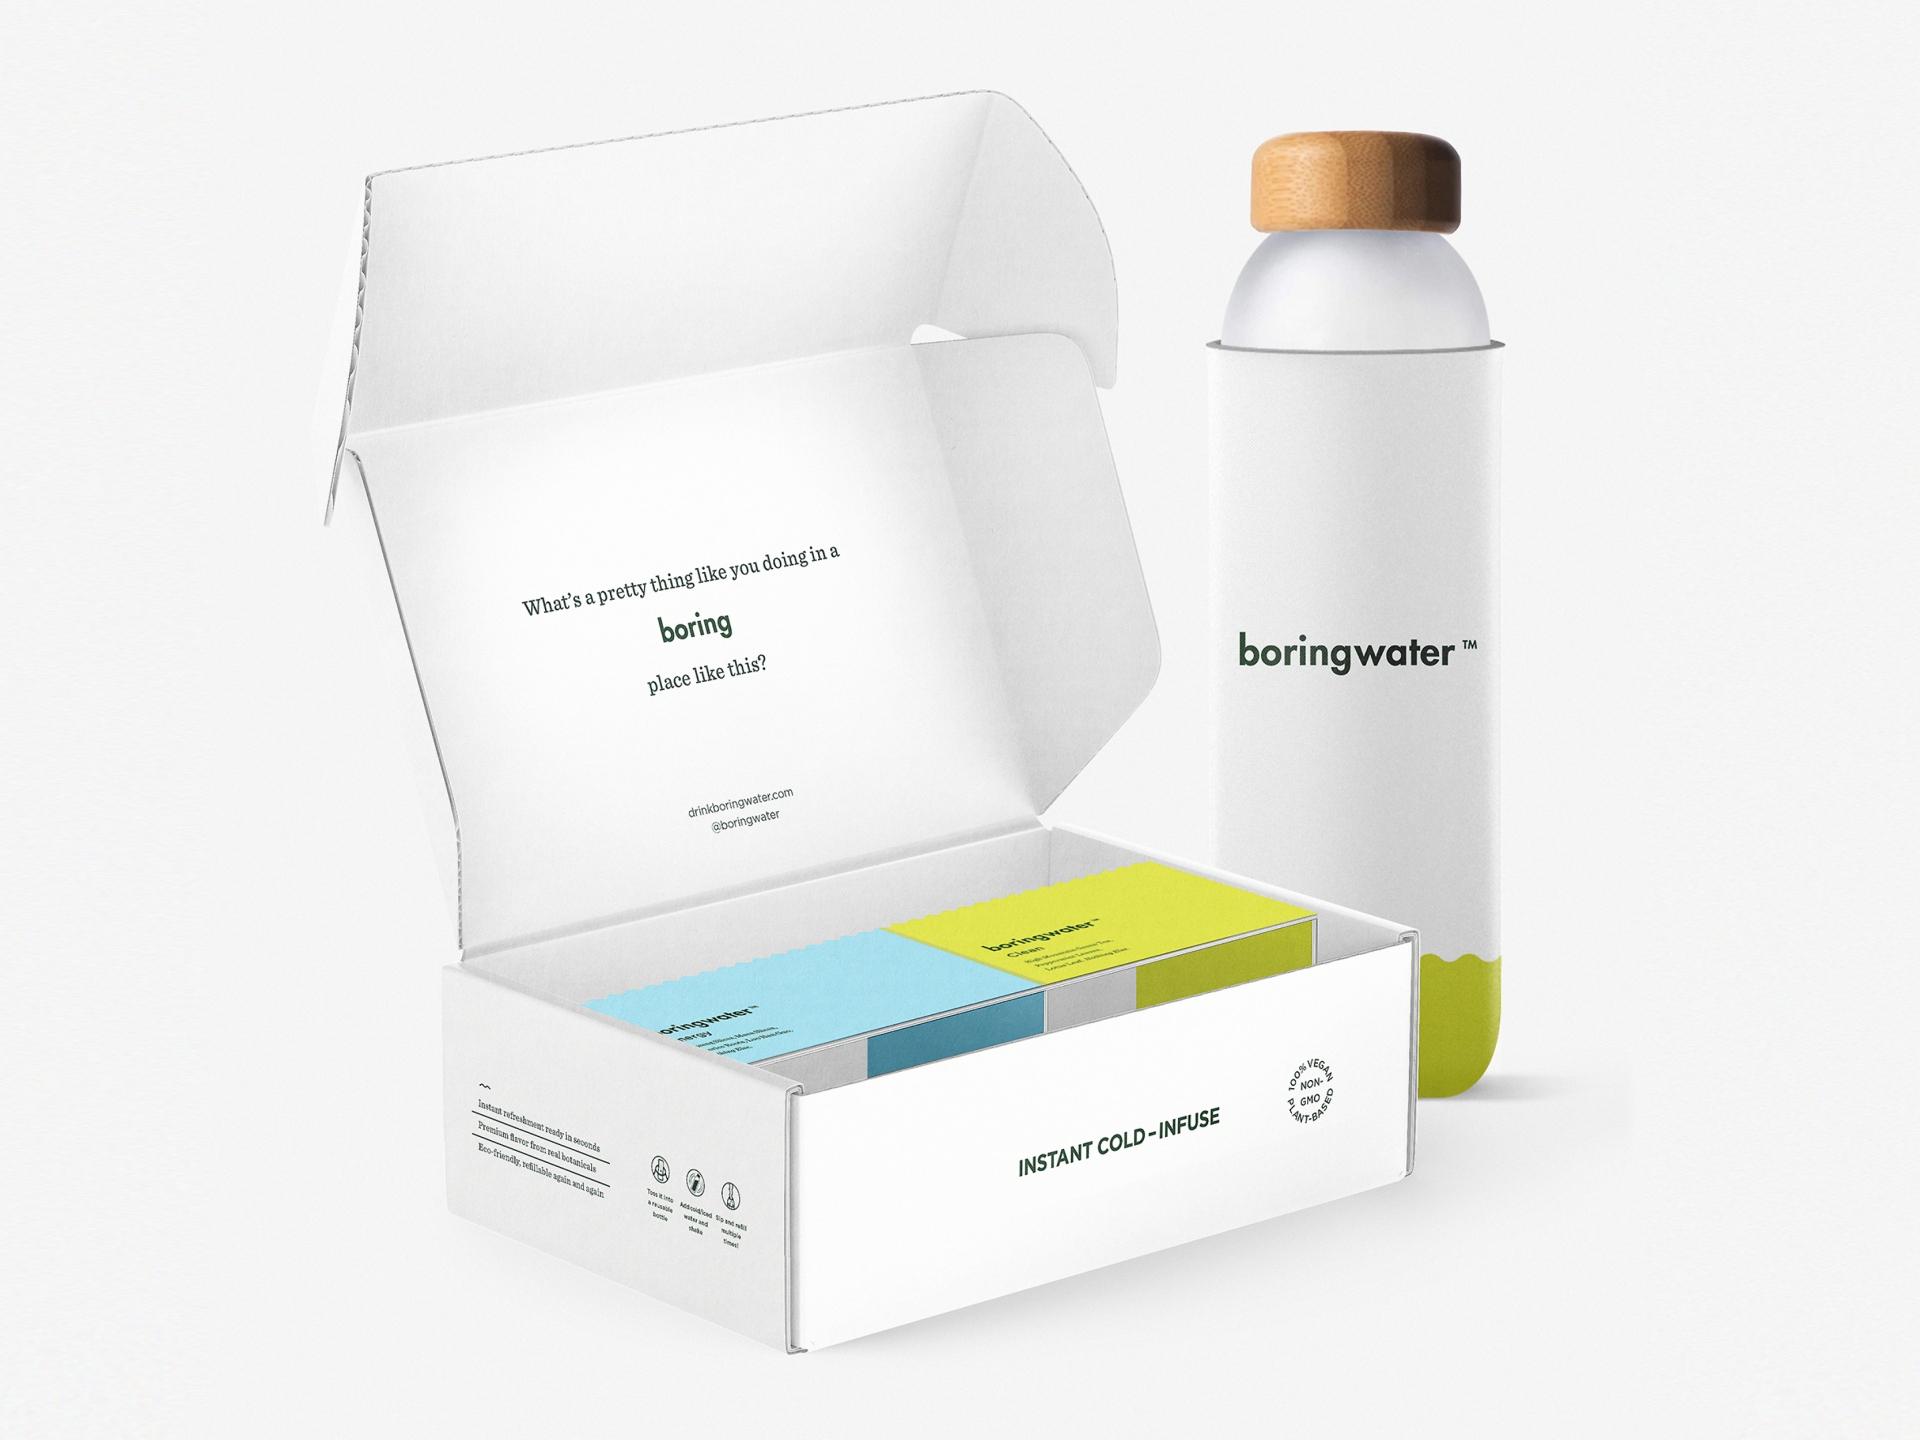 dribbble-clean-water-minimal-simple-design-san-francisco-zeki-michael-freelance-box-water-bottle-independent-studio-agency.jpg